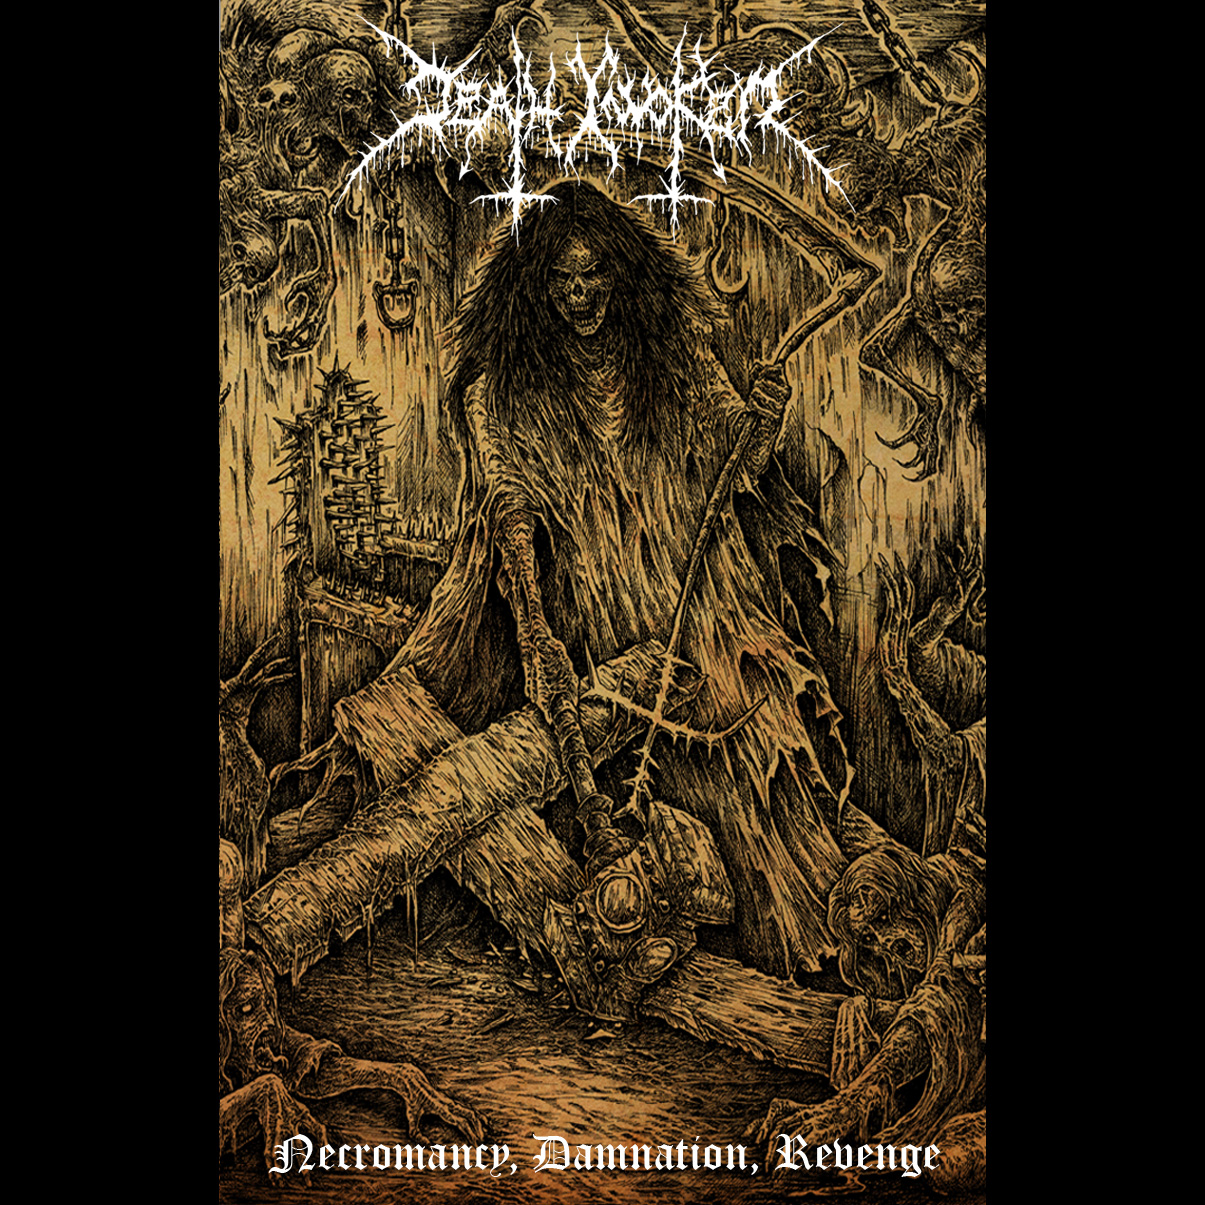 death invoker – necromancy, damnation, revenge [ep]